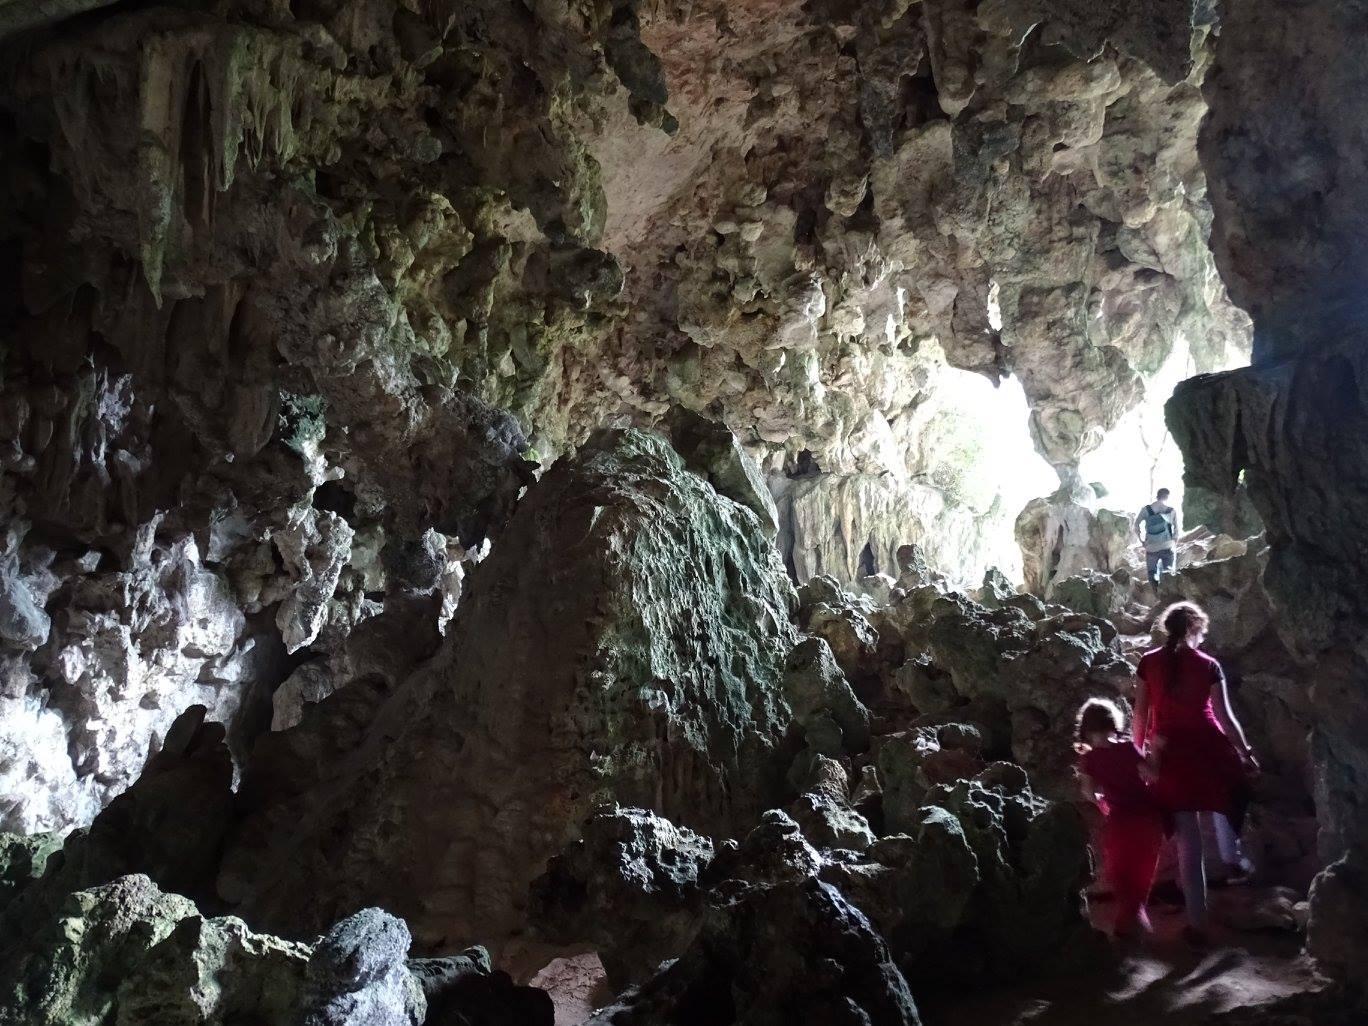 Candelaria Caves